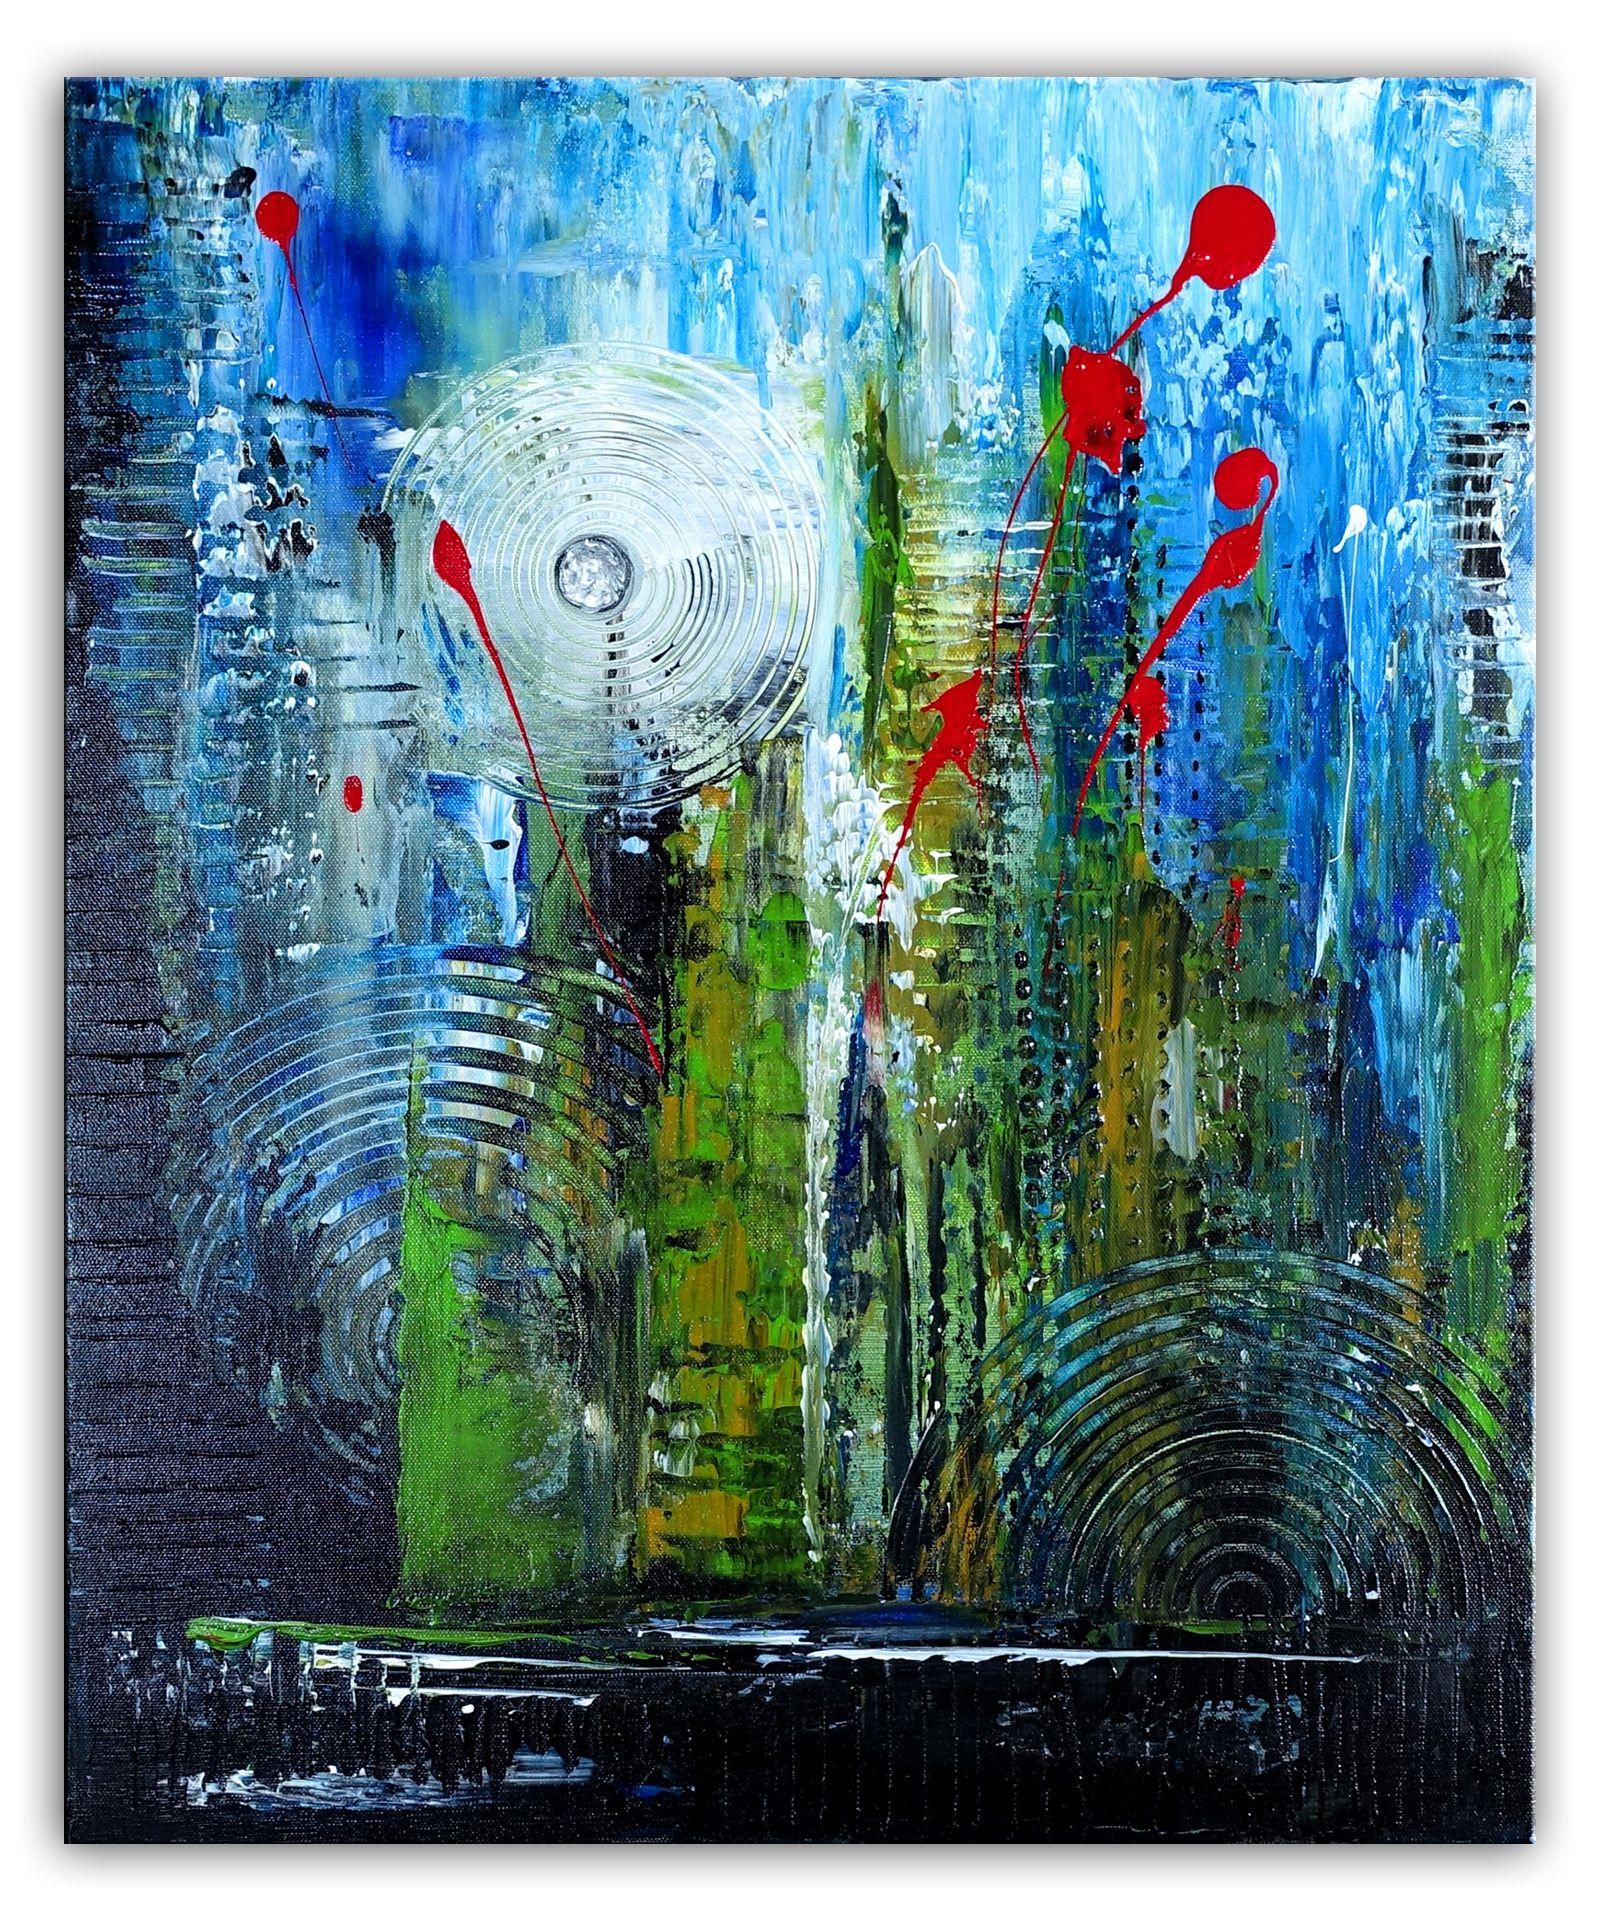 251 Verkaufte Abstrakte Malerei Rot Blau Querformat Abstrakte Wandbilder Original Gemalde Kunst Malerei Kunstwerke Unikat Abstrakte Malerei Abstrakt Malerei